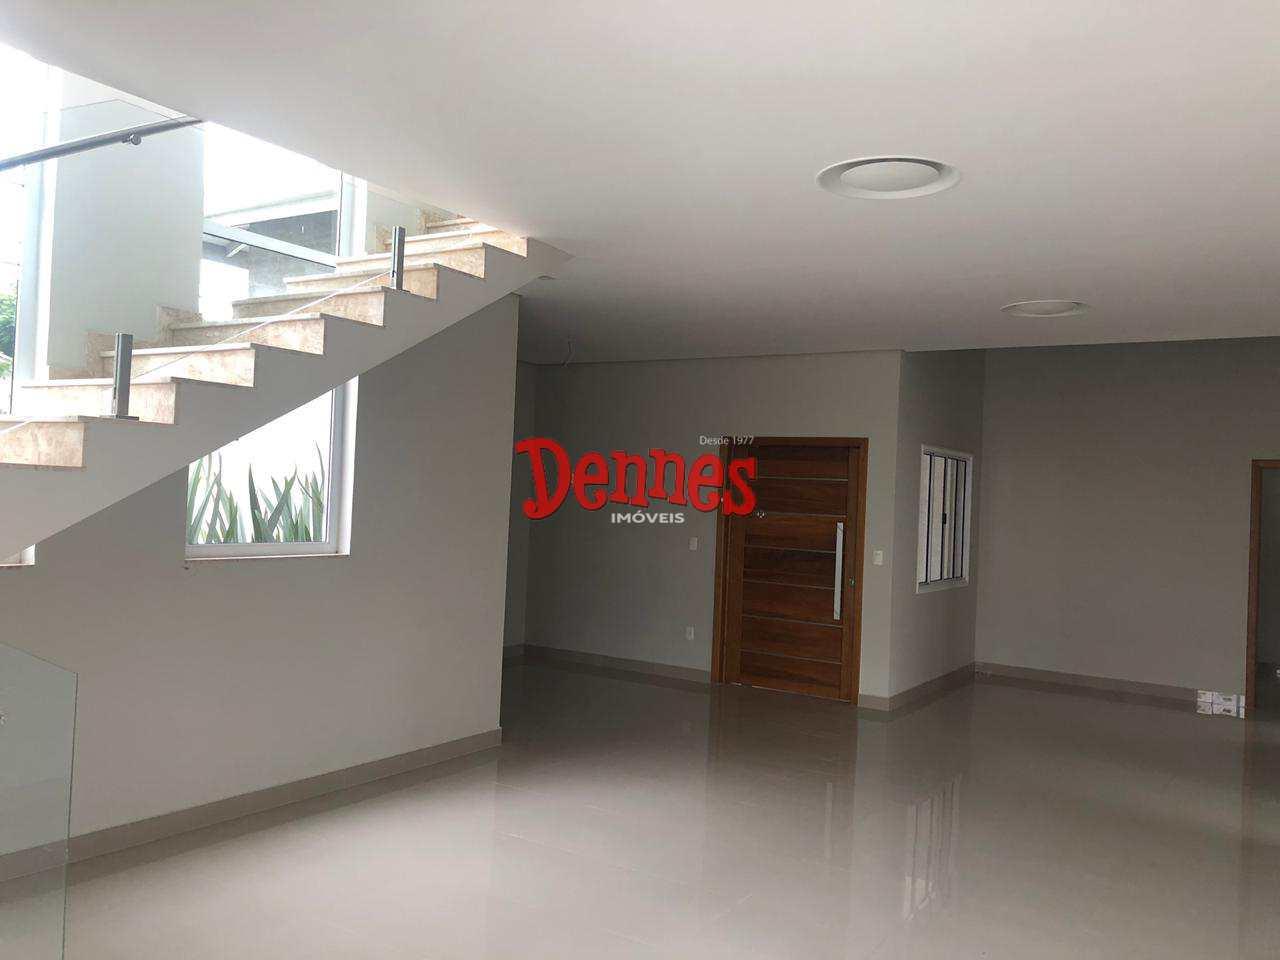 Casa de Condomínio com 3 dorms, Residencial Euroville, Bragança Paulista - R$ 1.3 mi, Cod: 427